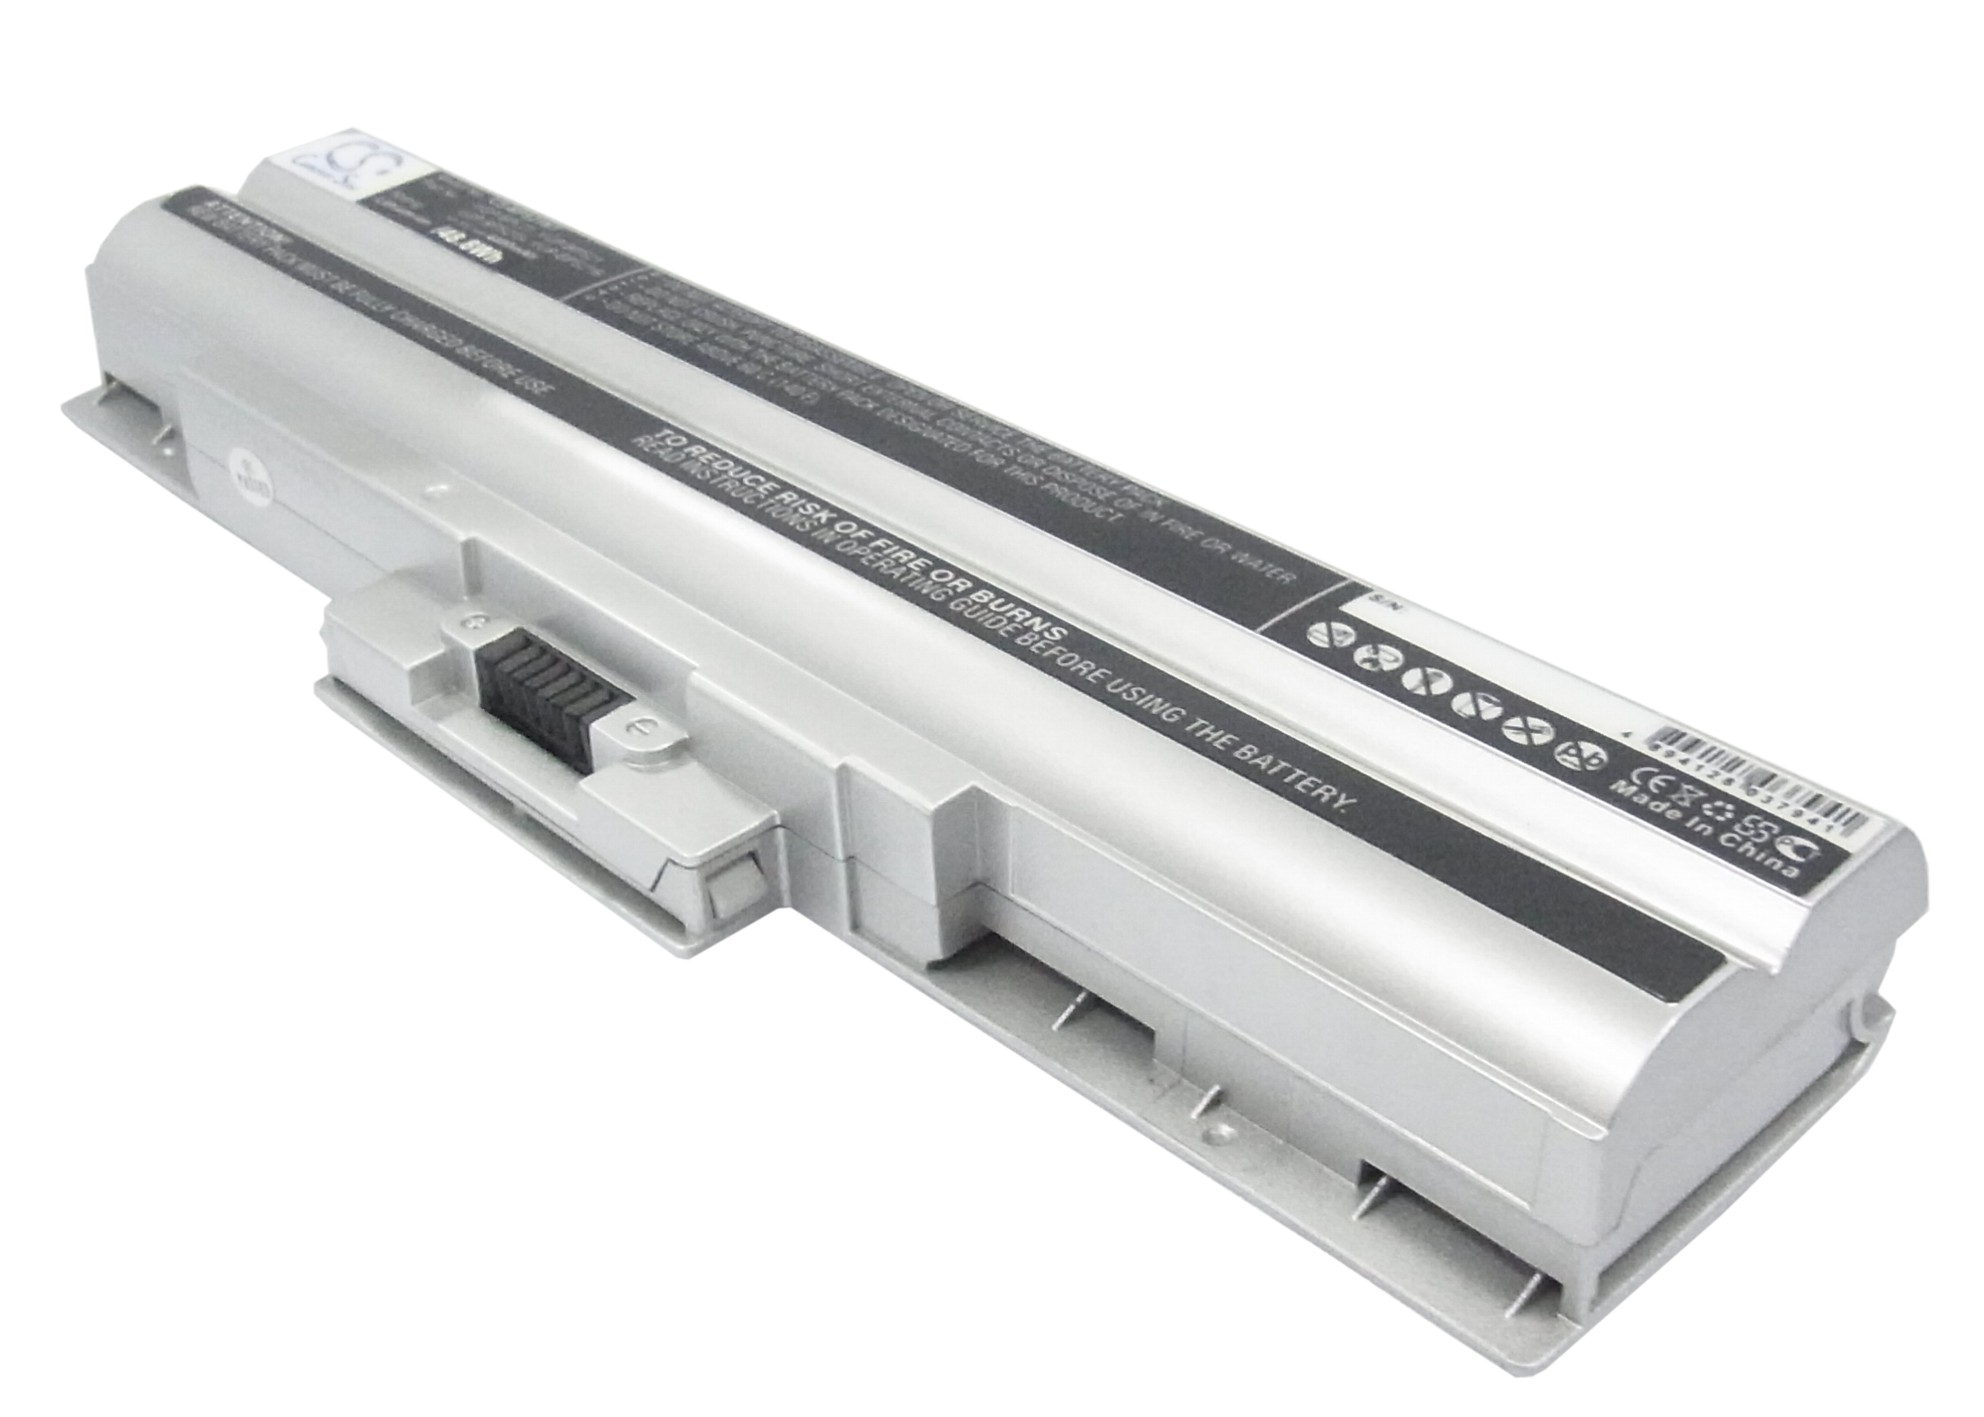 Cameron Sino baterie do notebooků pro SONY VAIO VPCF11Z1E 11.1V Li-ion 4400mAh stříbrná - neoriginální